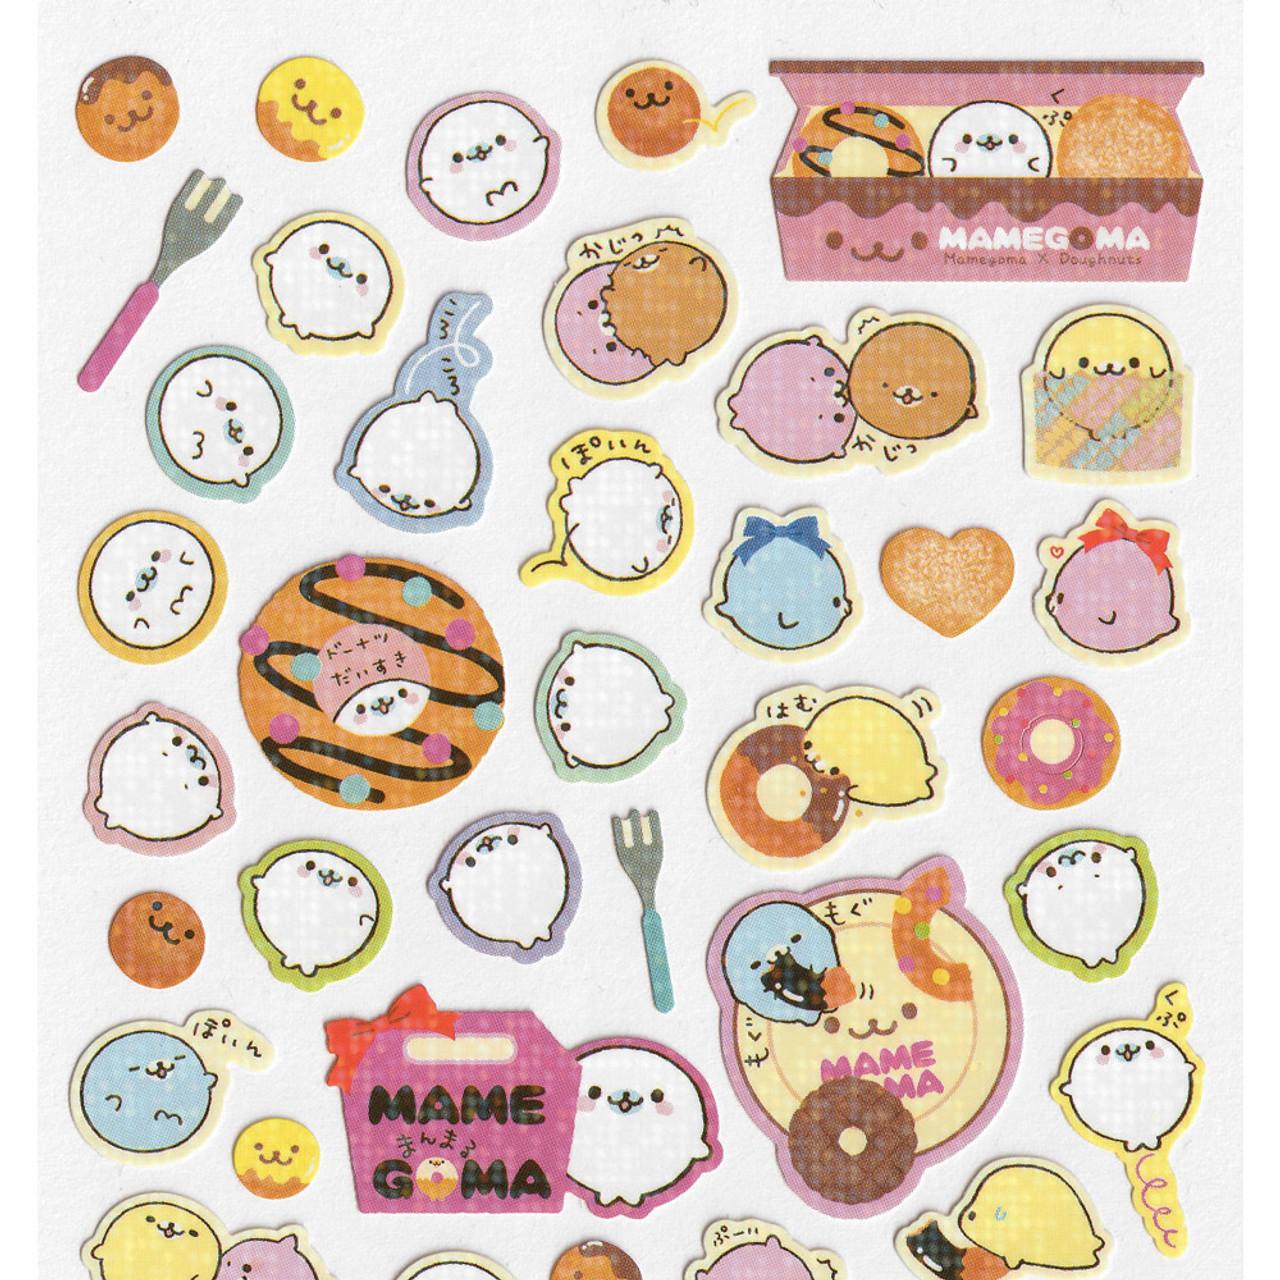 Mamegoma Sea Lion Glitters Sticker SE07101 ( Top Part )